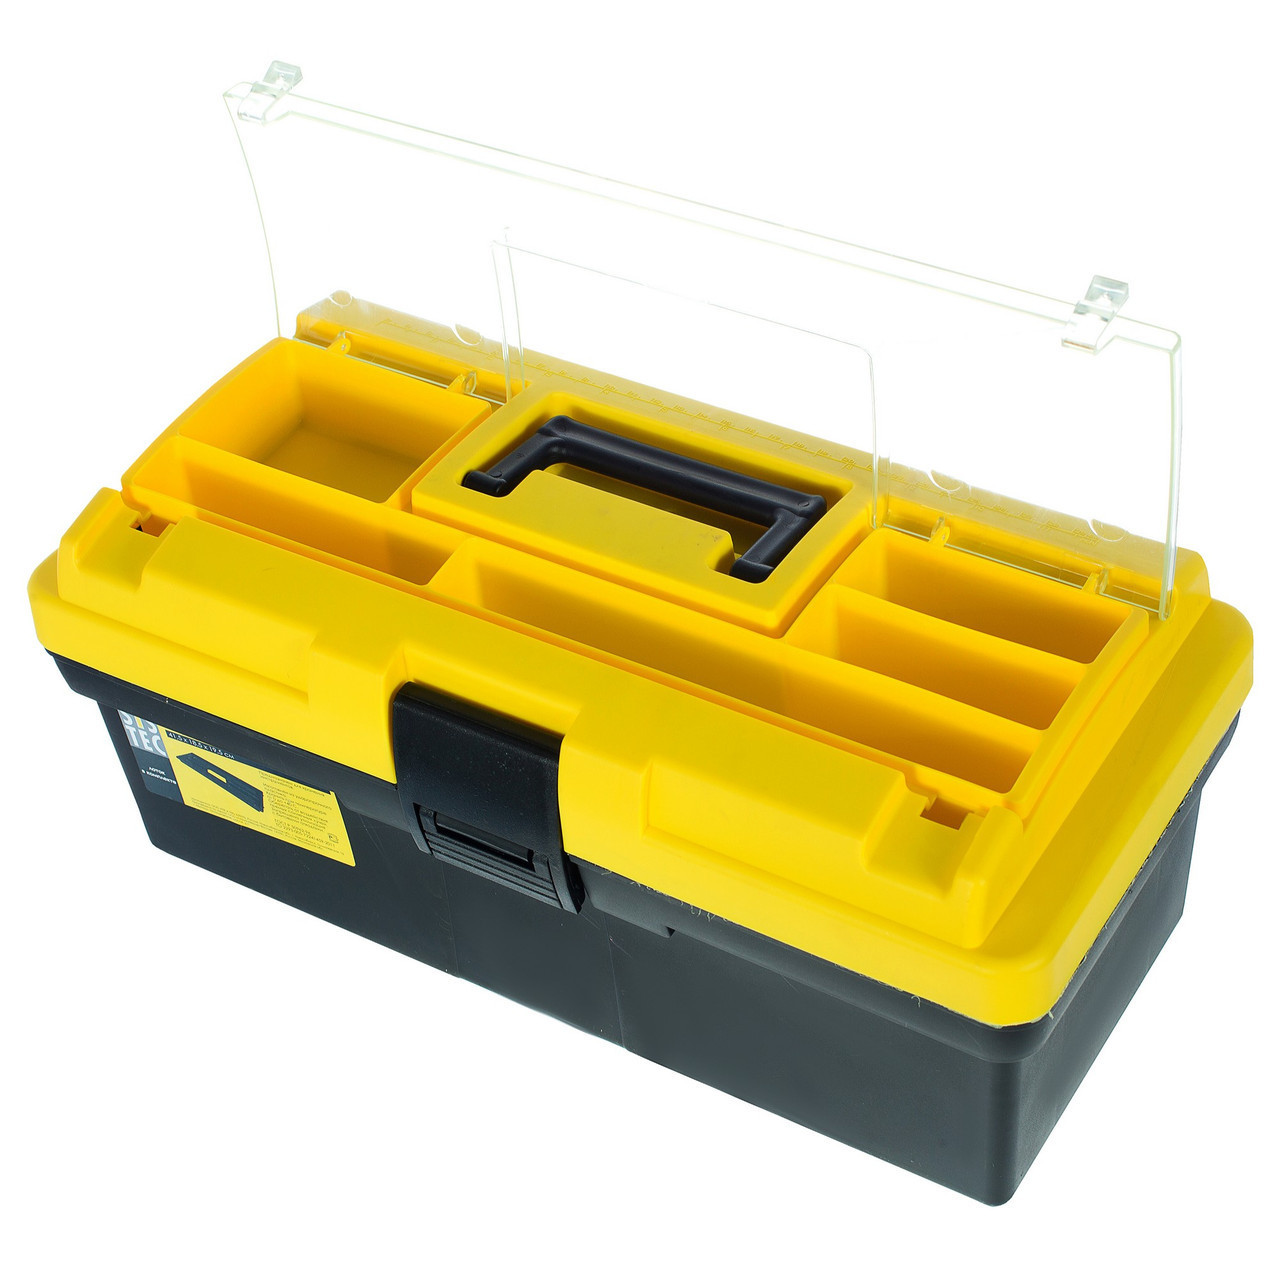 Ящик для инструмента  195х185х415 мм, пластик, цвет черно-жёлтый,съемная полка